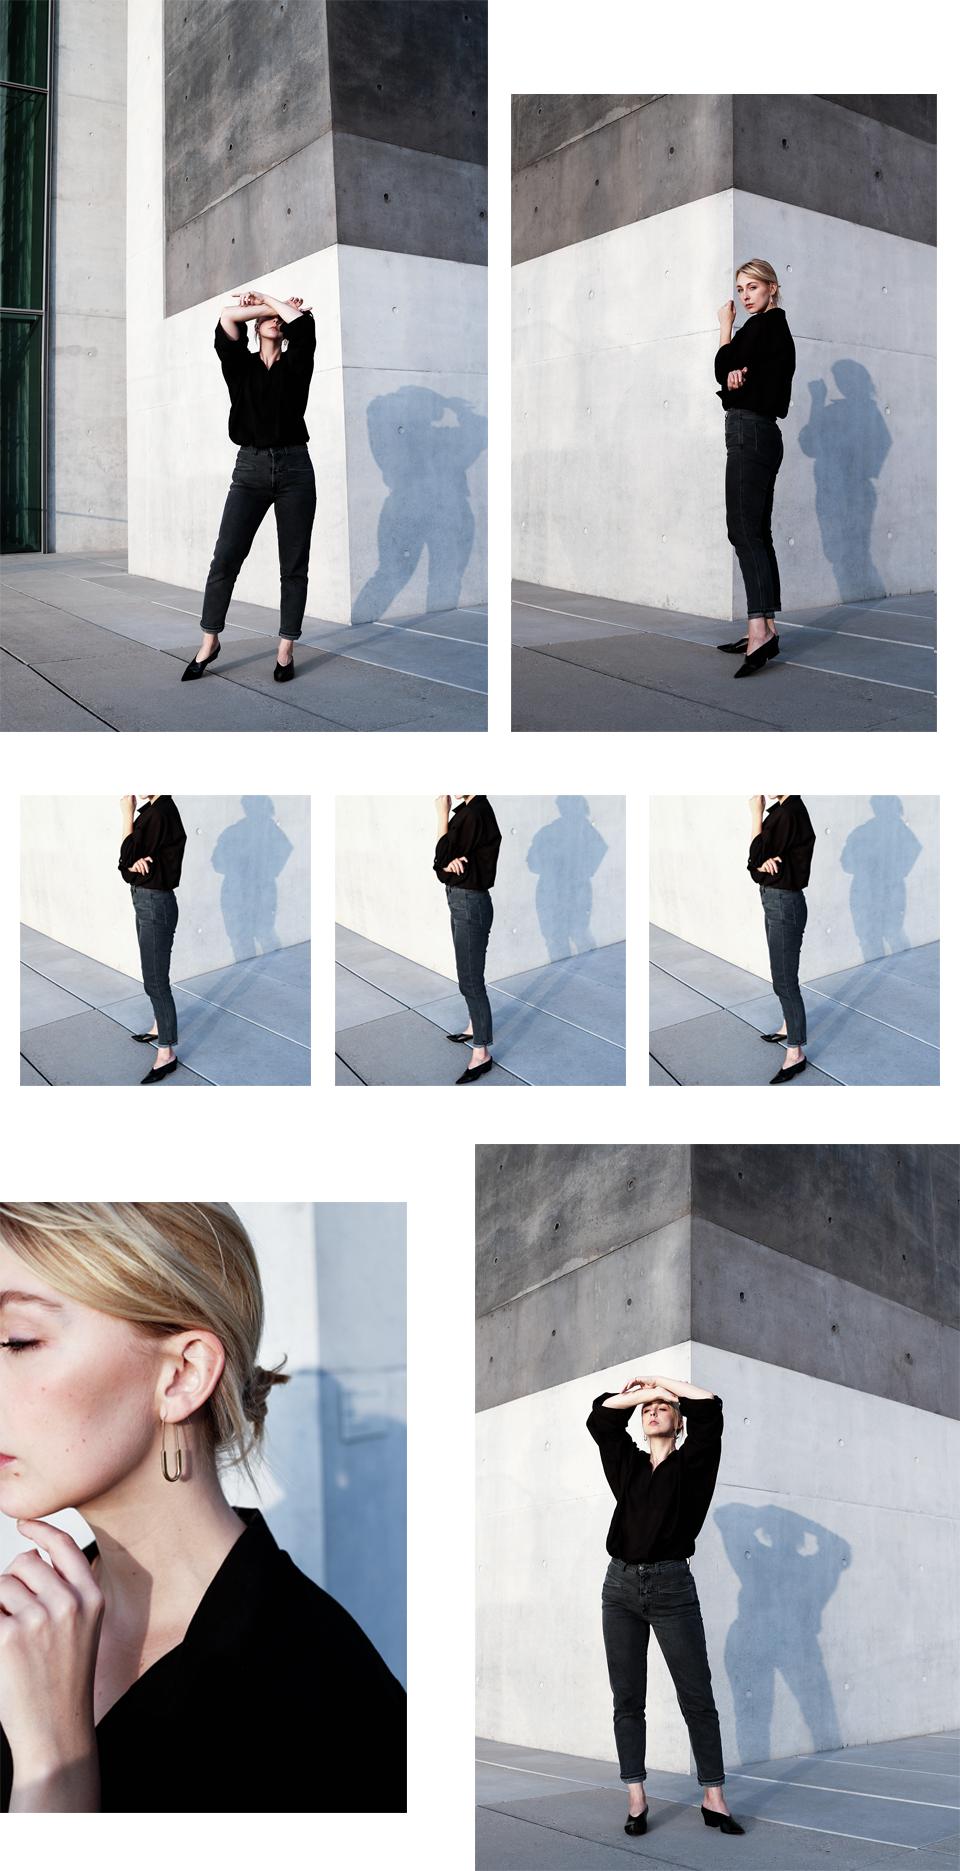 noa-noir-fashion-outfit-closed-pedal-pusher-aakasha-blouse-maria-black-1-1.png